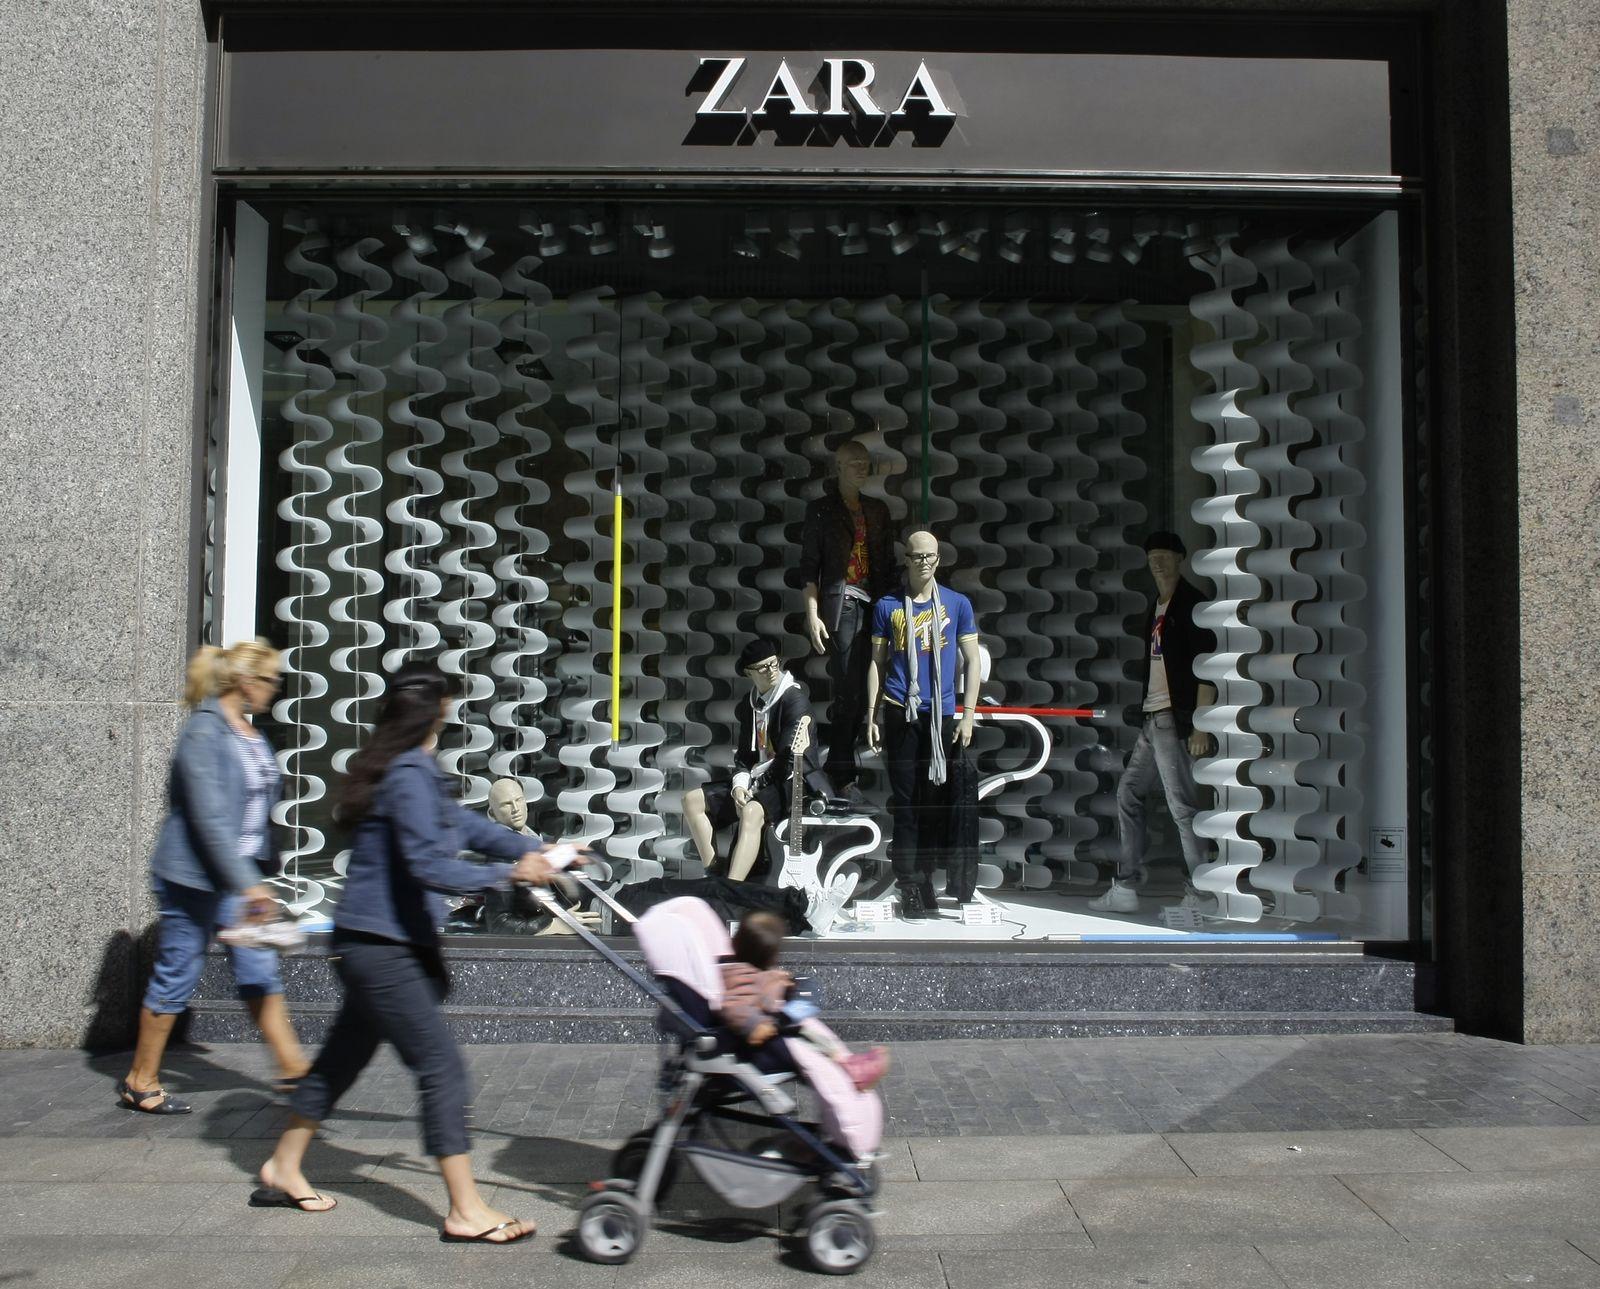 Zara / Modeketten / Modemarken